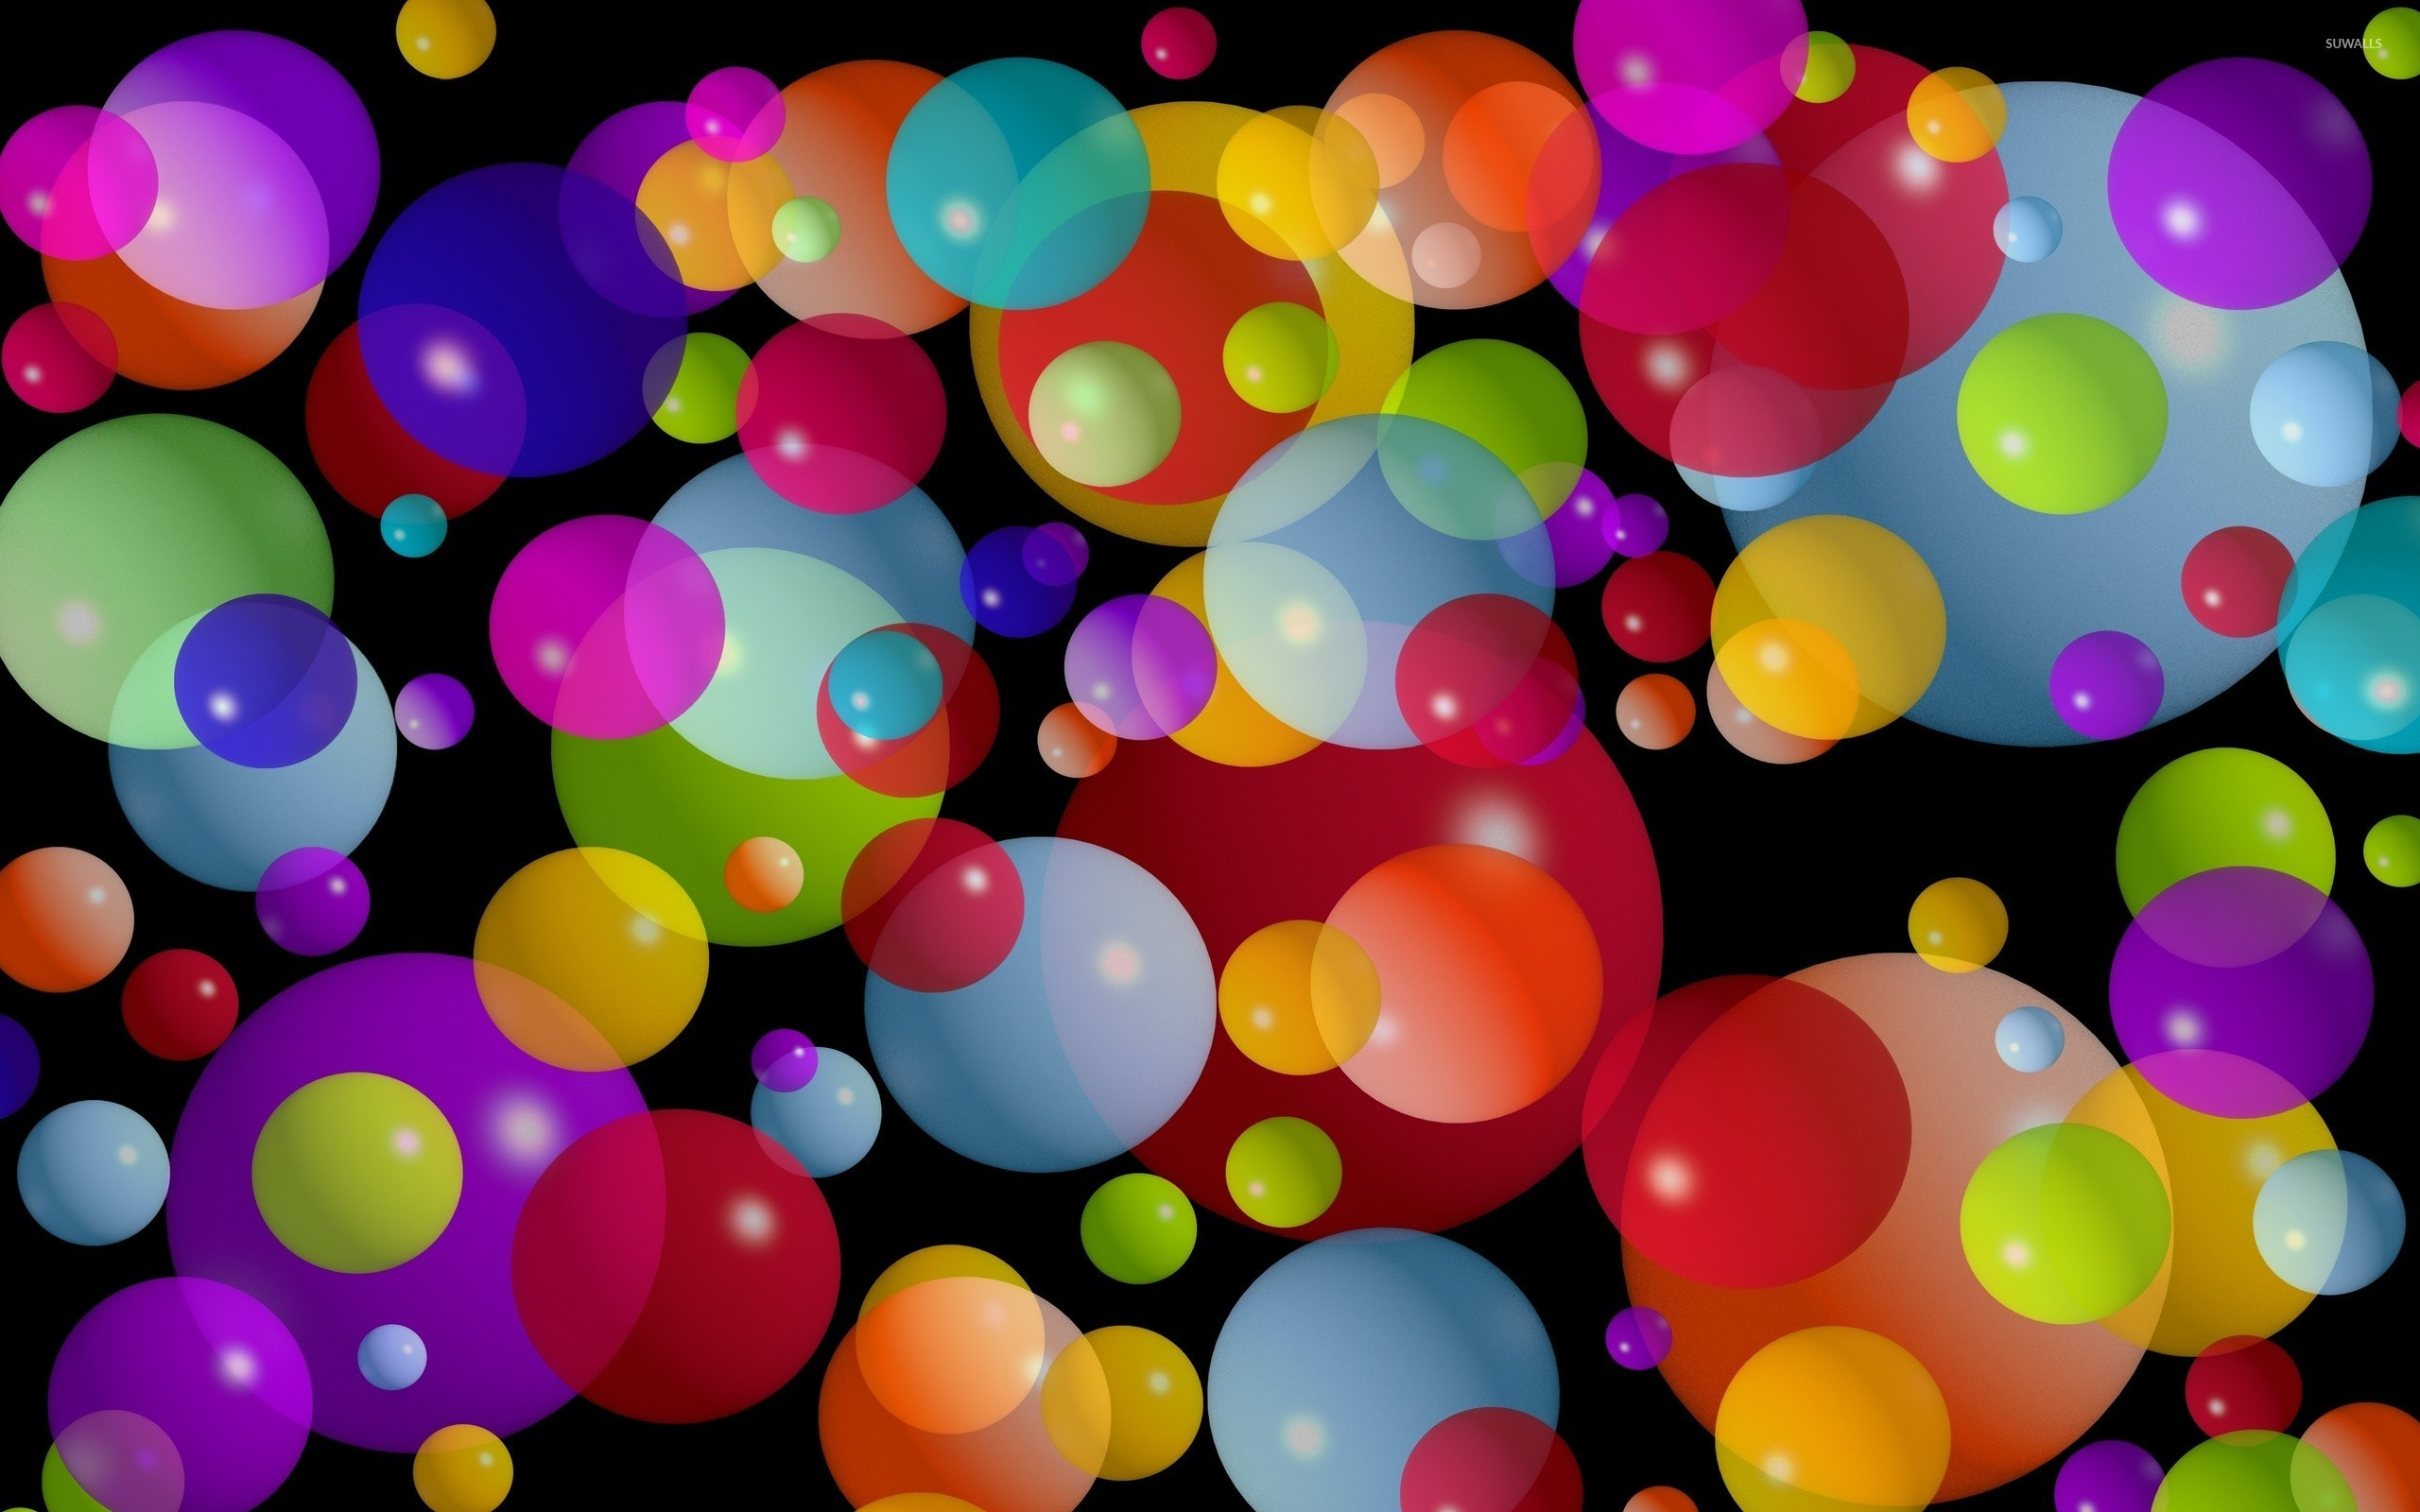 Colorful bubbles wallpaper - Digital Art wallpapers - #25091